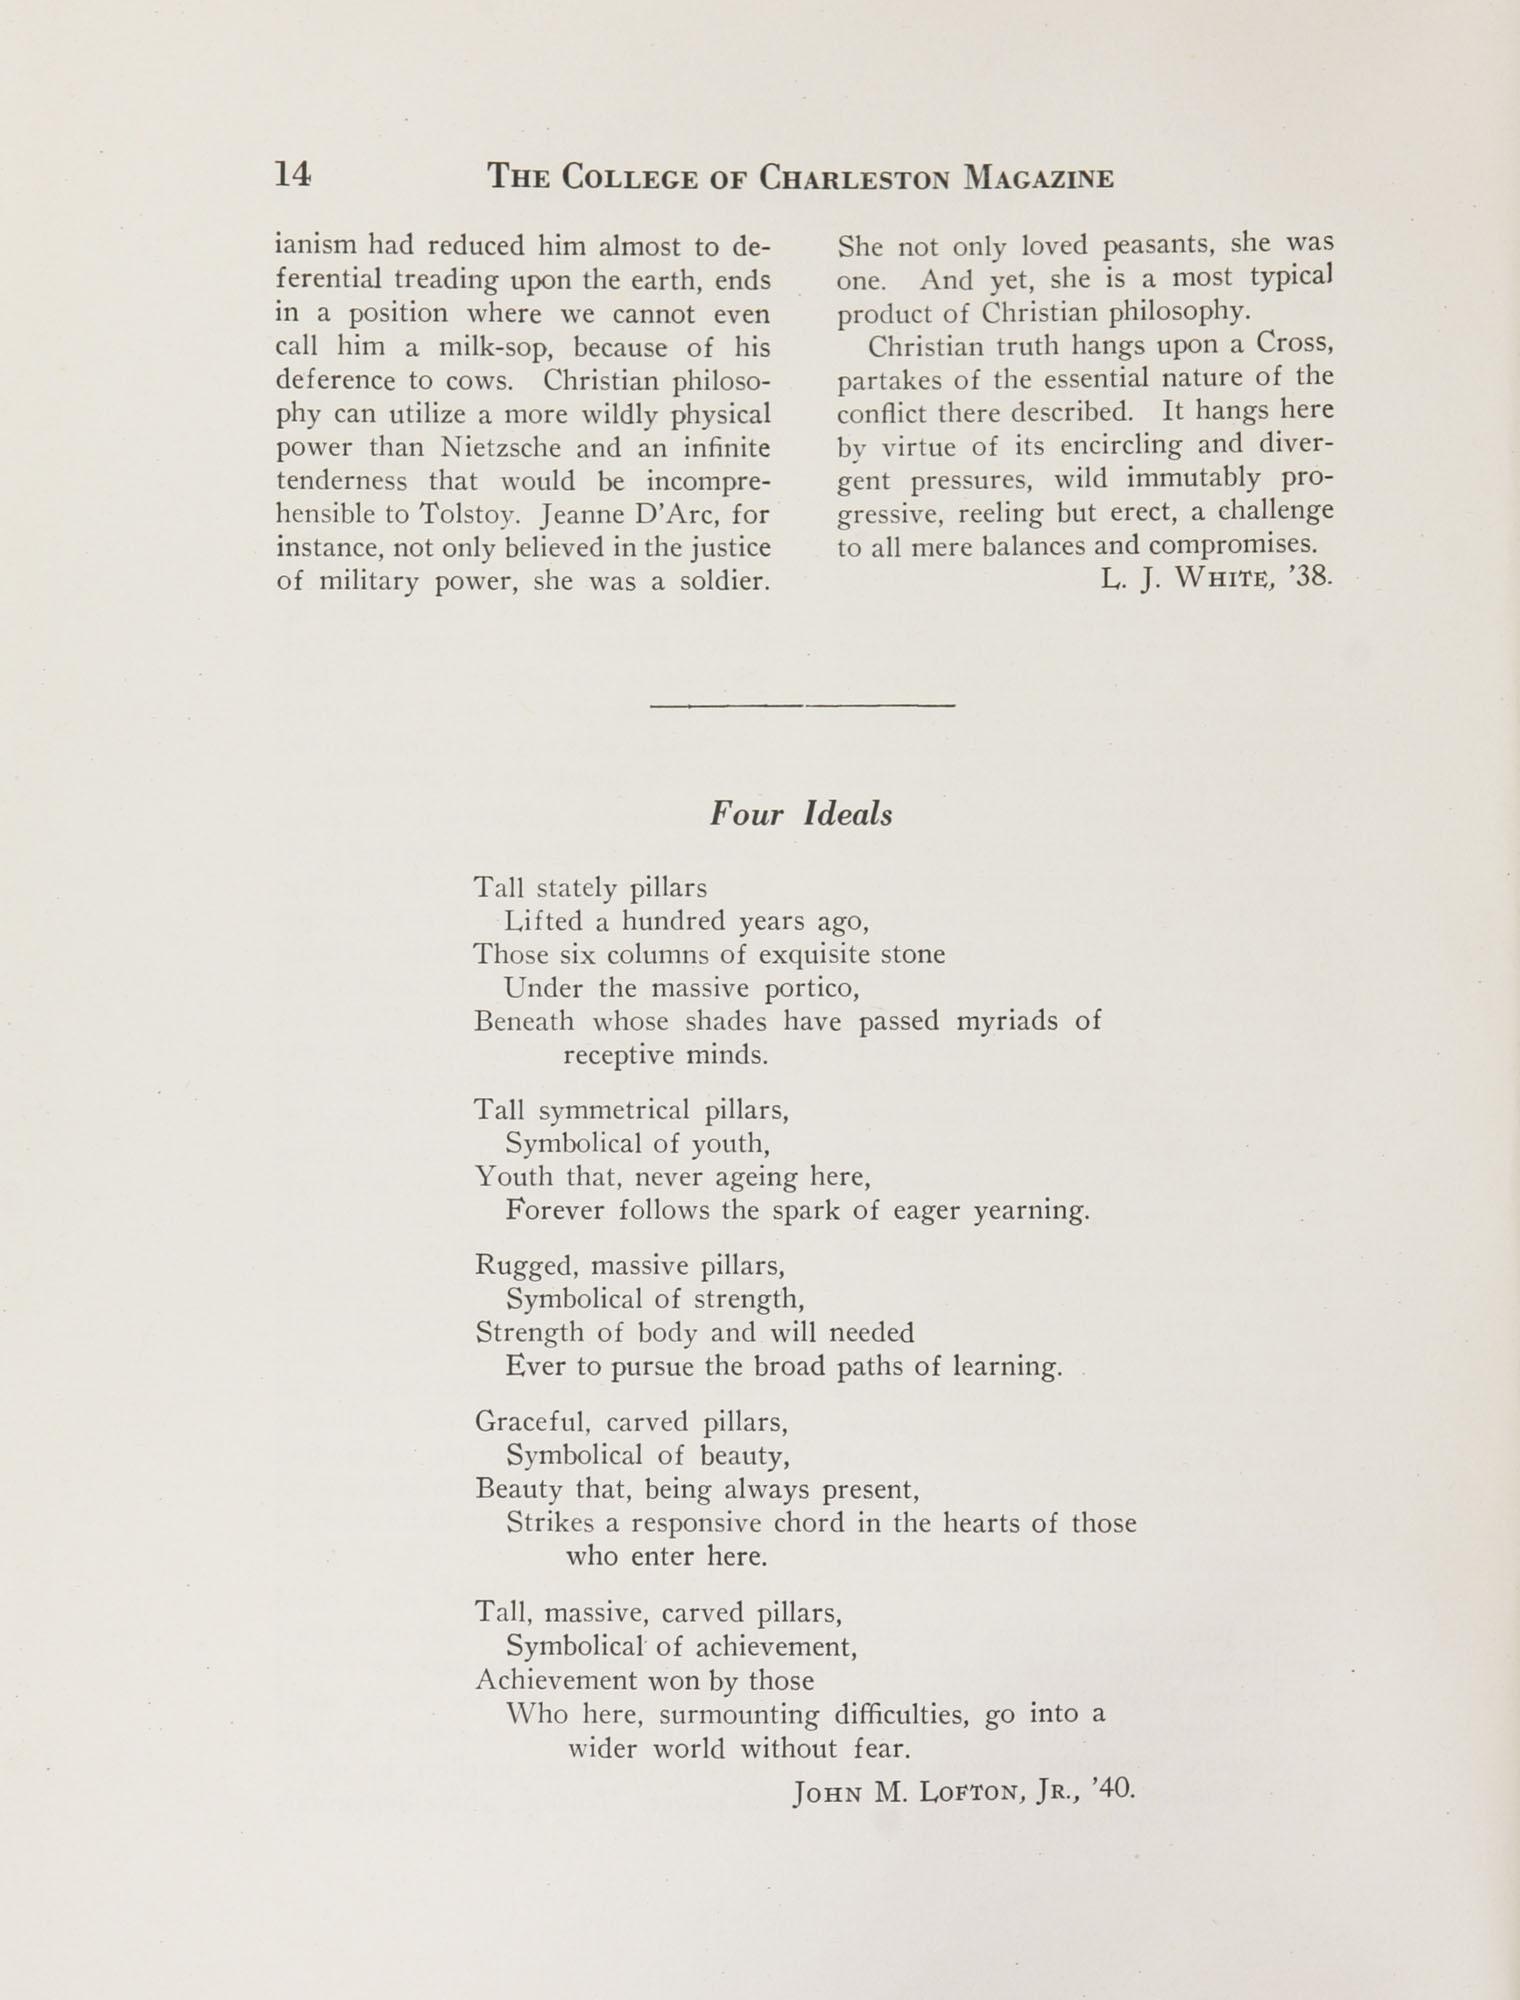 College of Charleston Magazine, 1937-1938, Vol. XXXXI No. 1, page 14